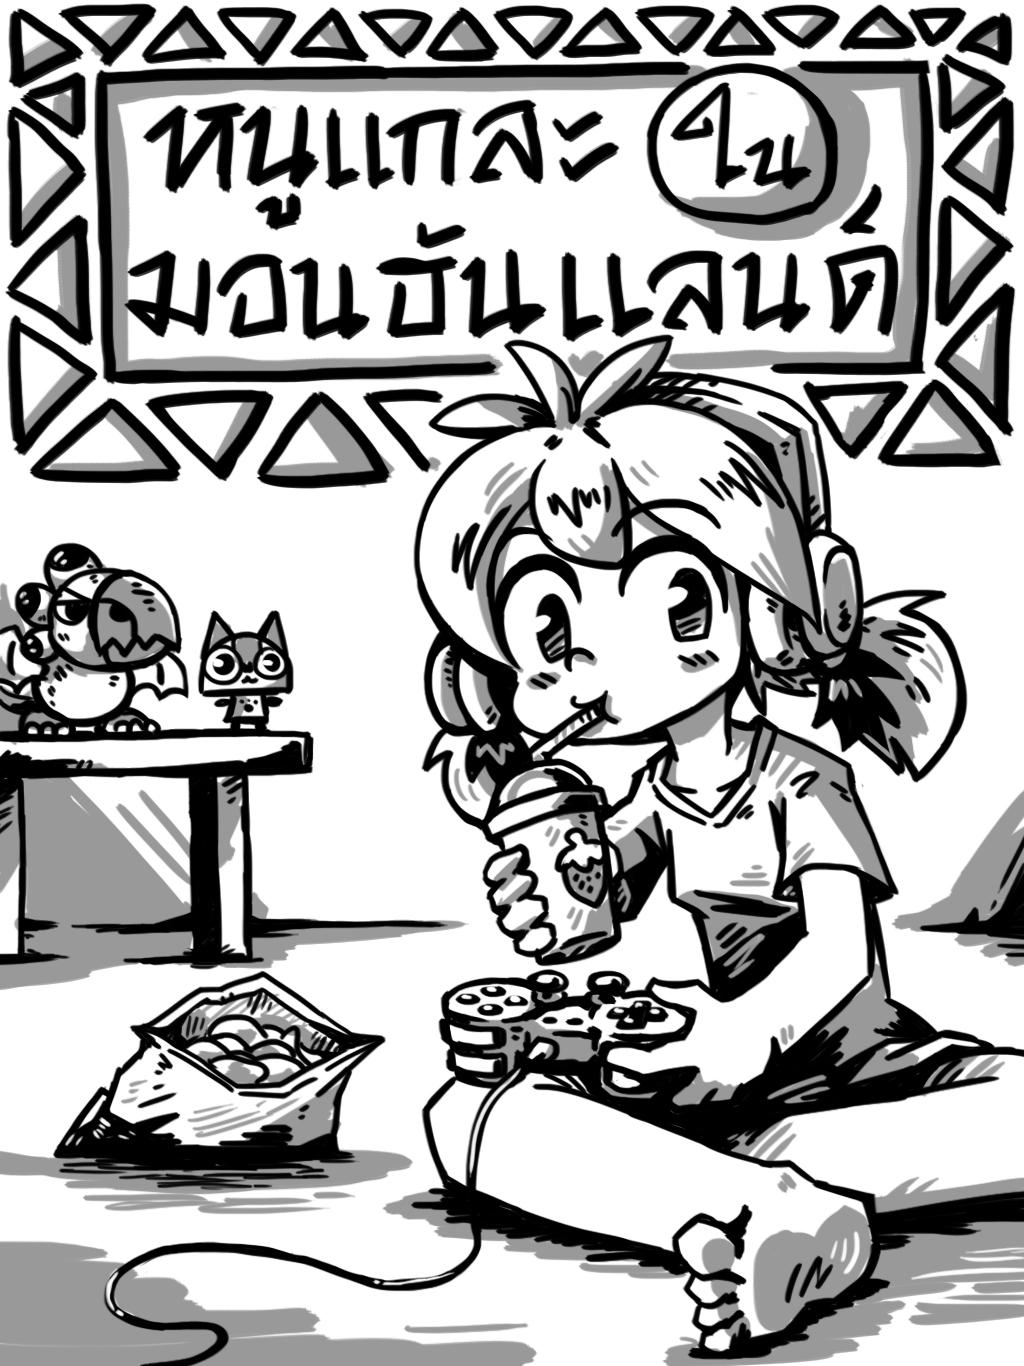 PS4น้องสาว - PS4 จากน้อง